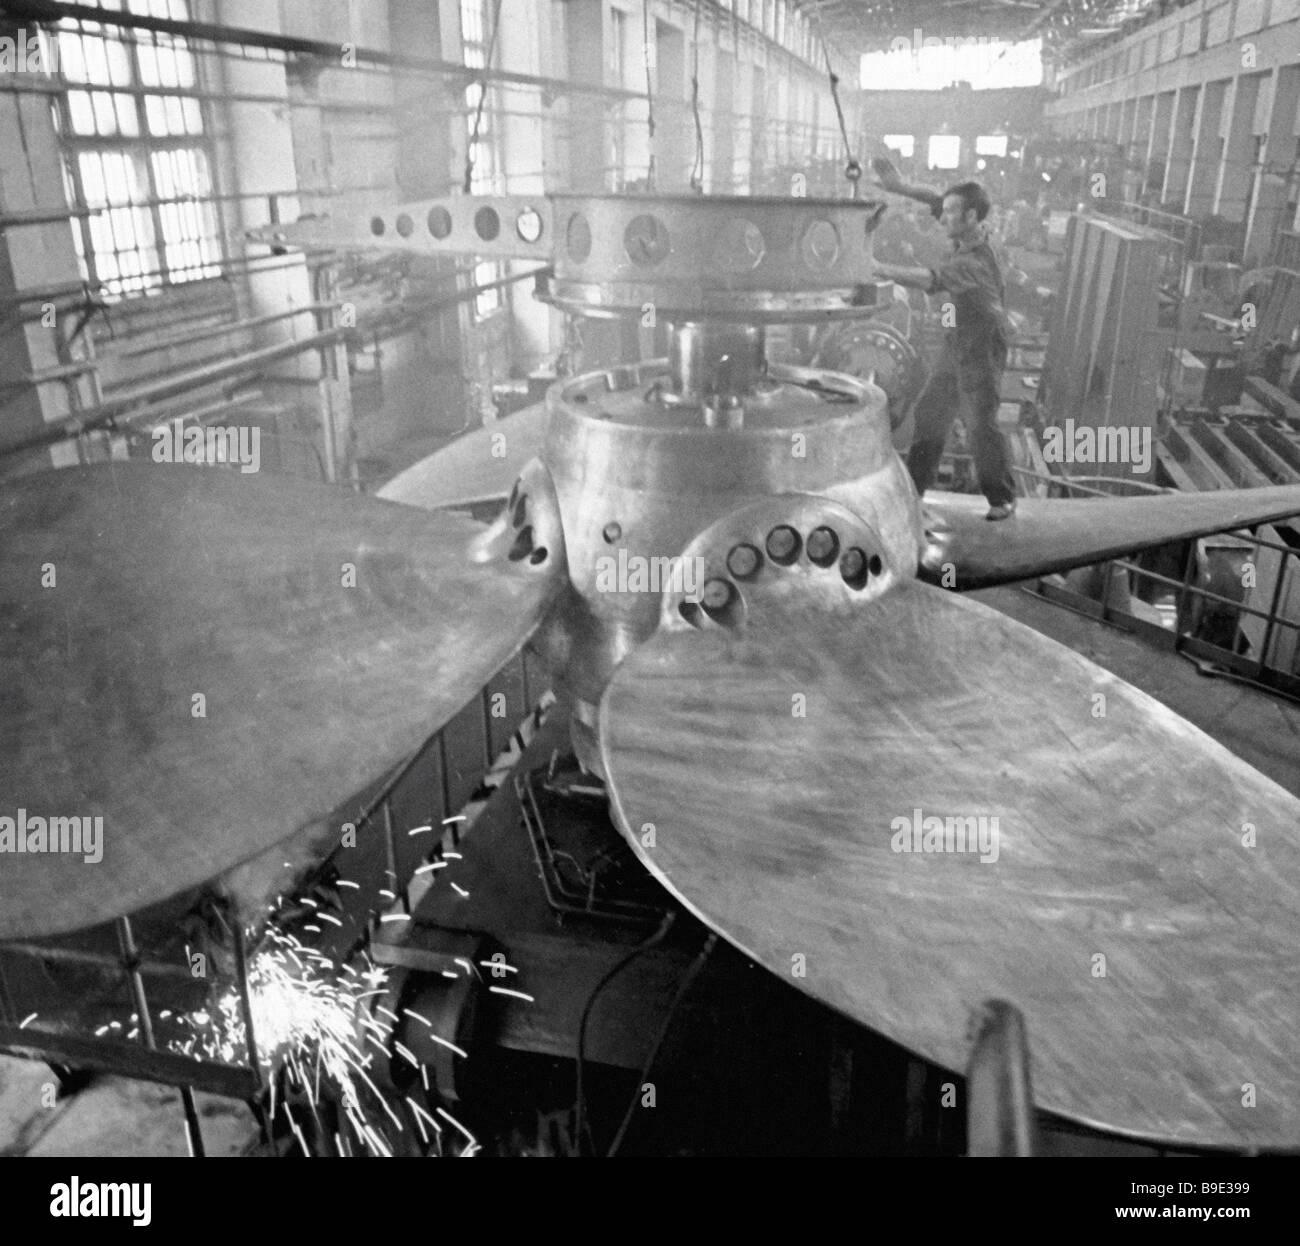 A screw propeller of the adjustable pitch for the Krym tanker Proletarsky plant - Stock Image